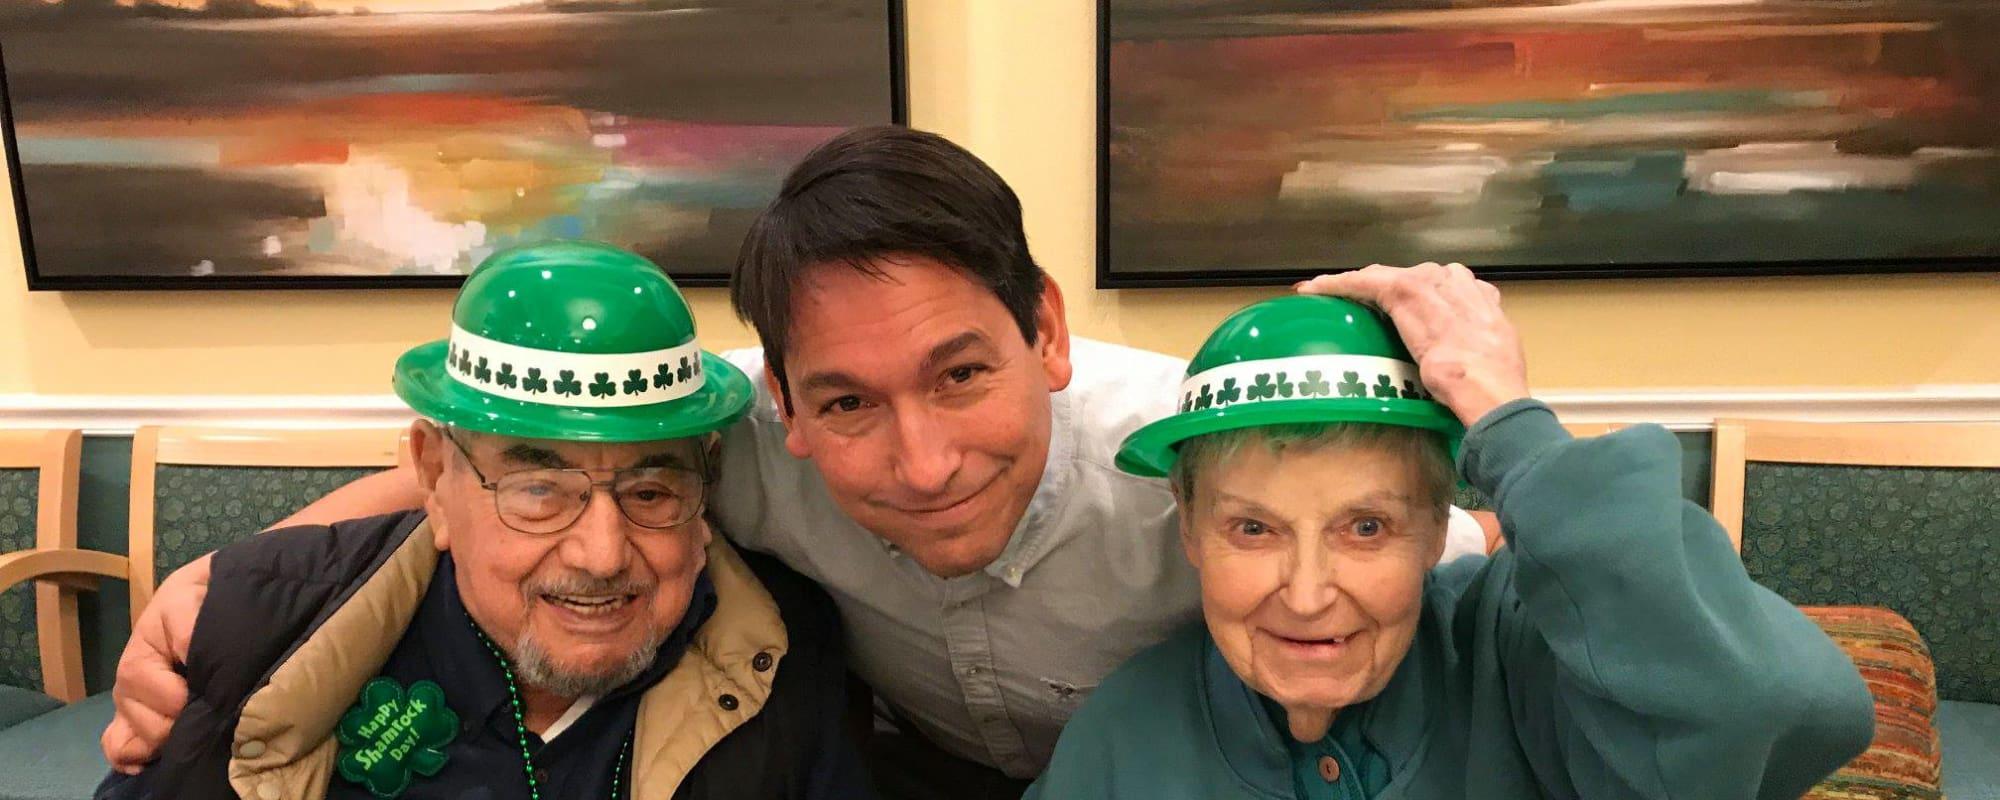 Seniors at Cottonwood Creek celebrate St. Patrick's Day!